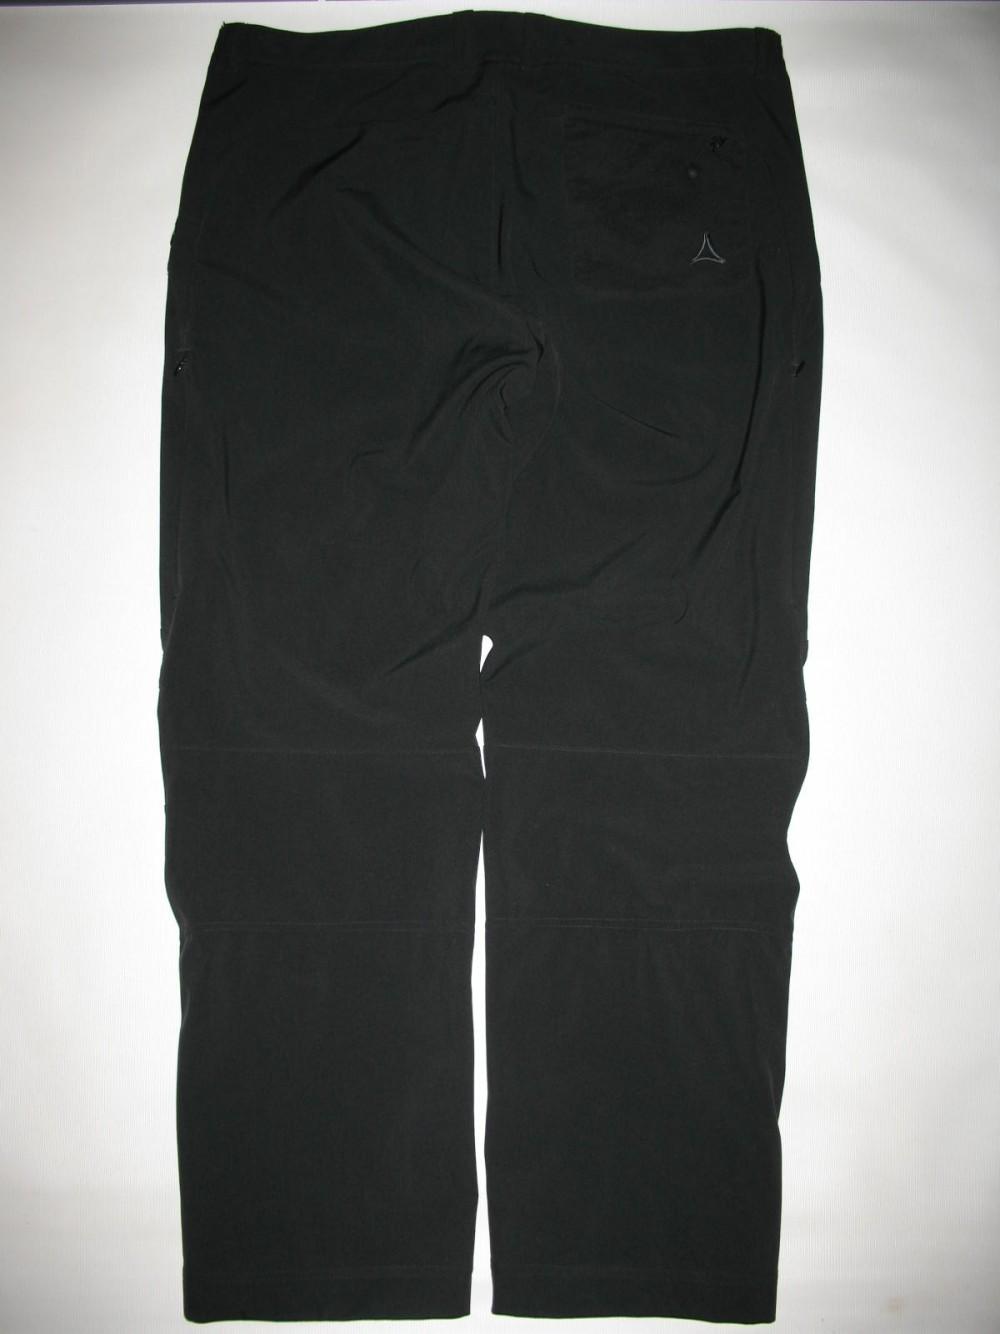 Штаны SCHOFFEL ice trail softshell pants (размер 56/XXL) - 1